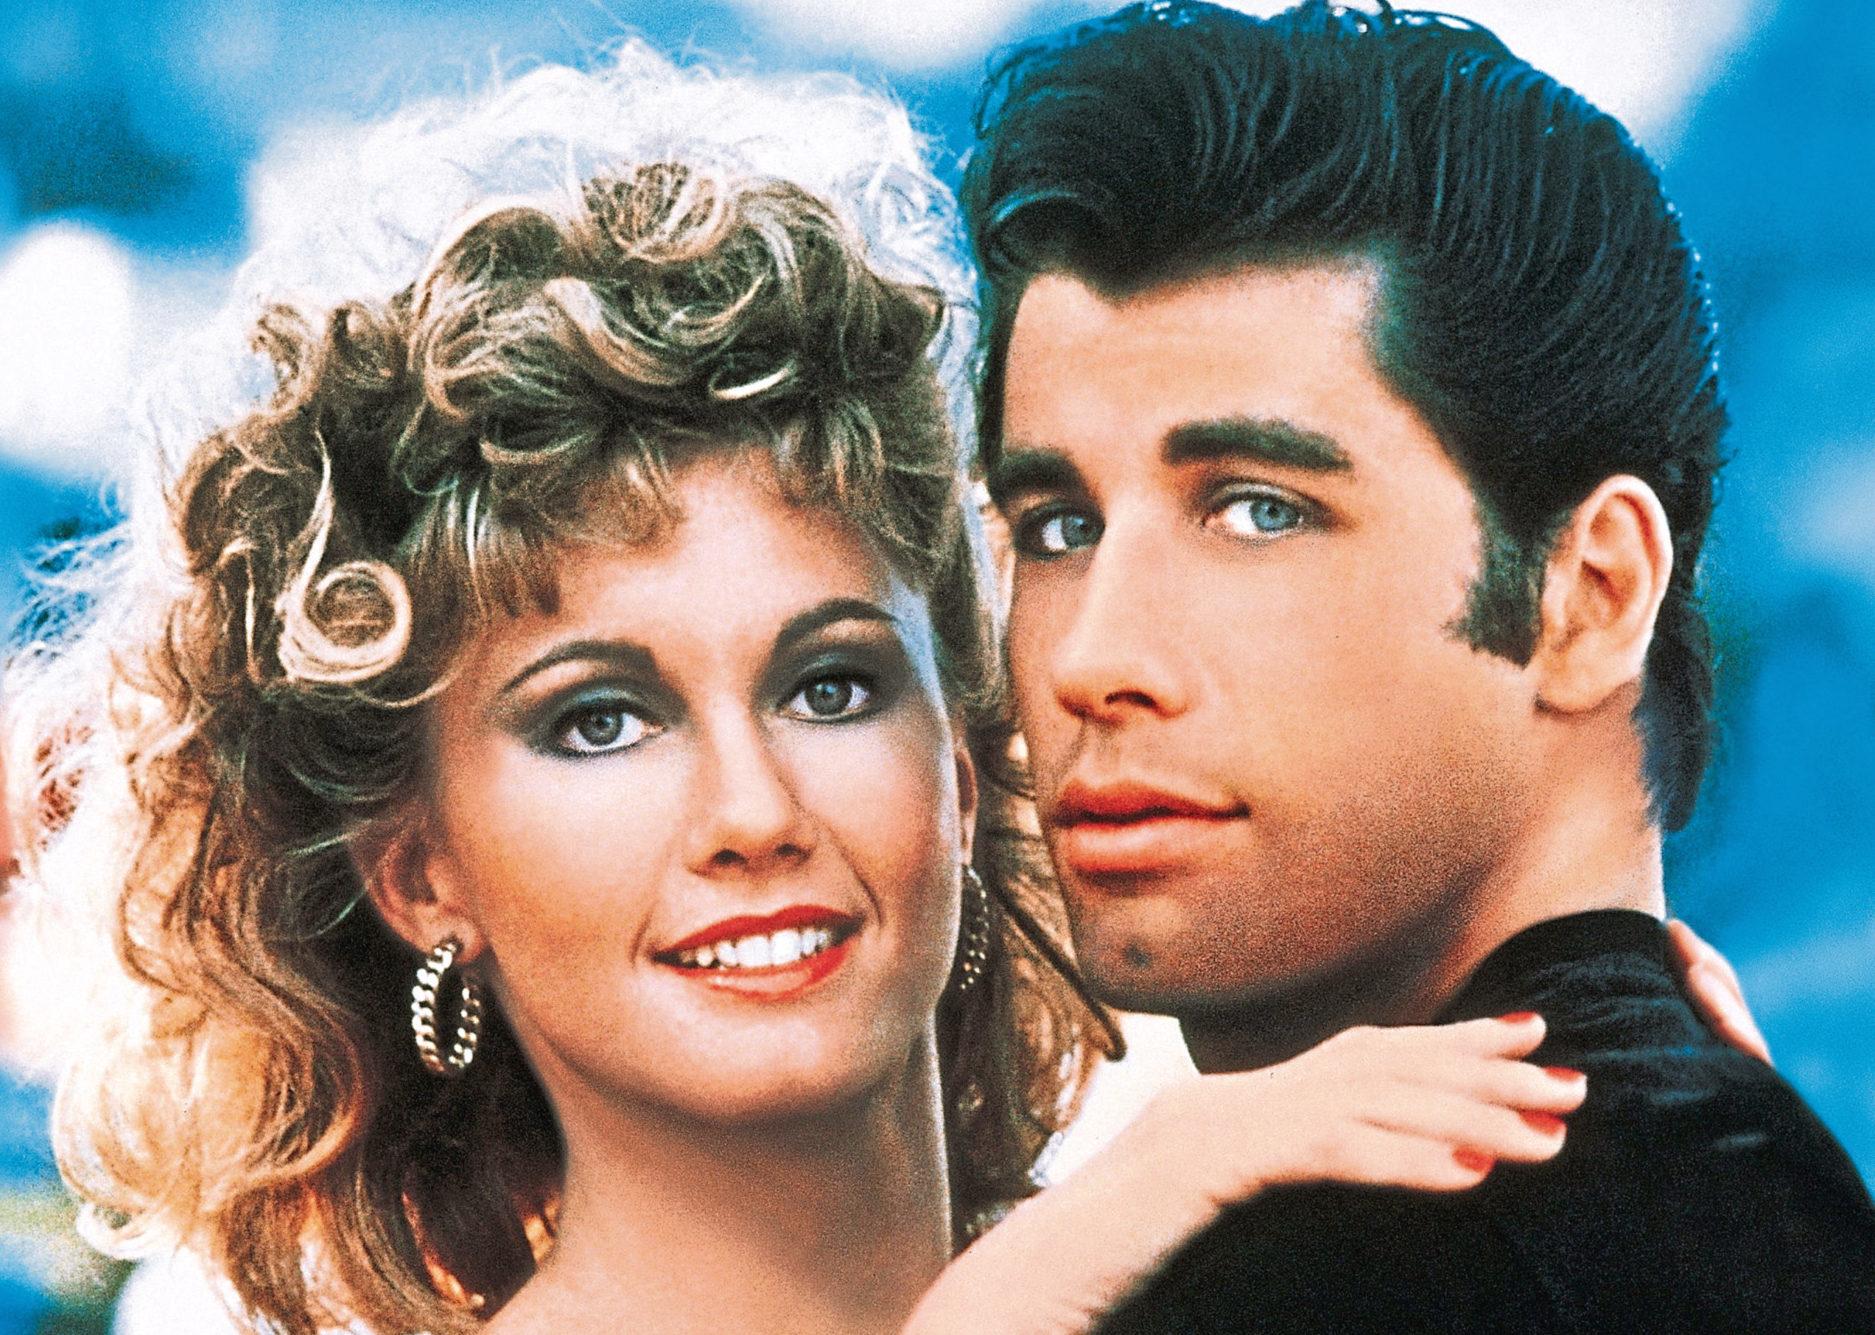 Olivia Newton-John and John Travolta in their starring roles